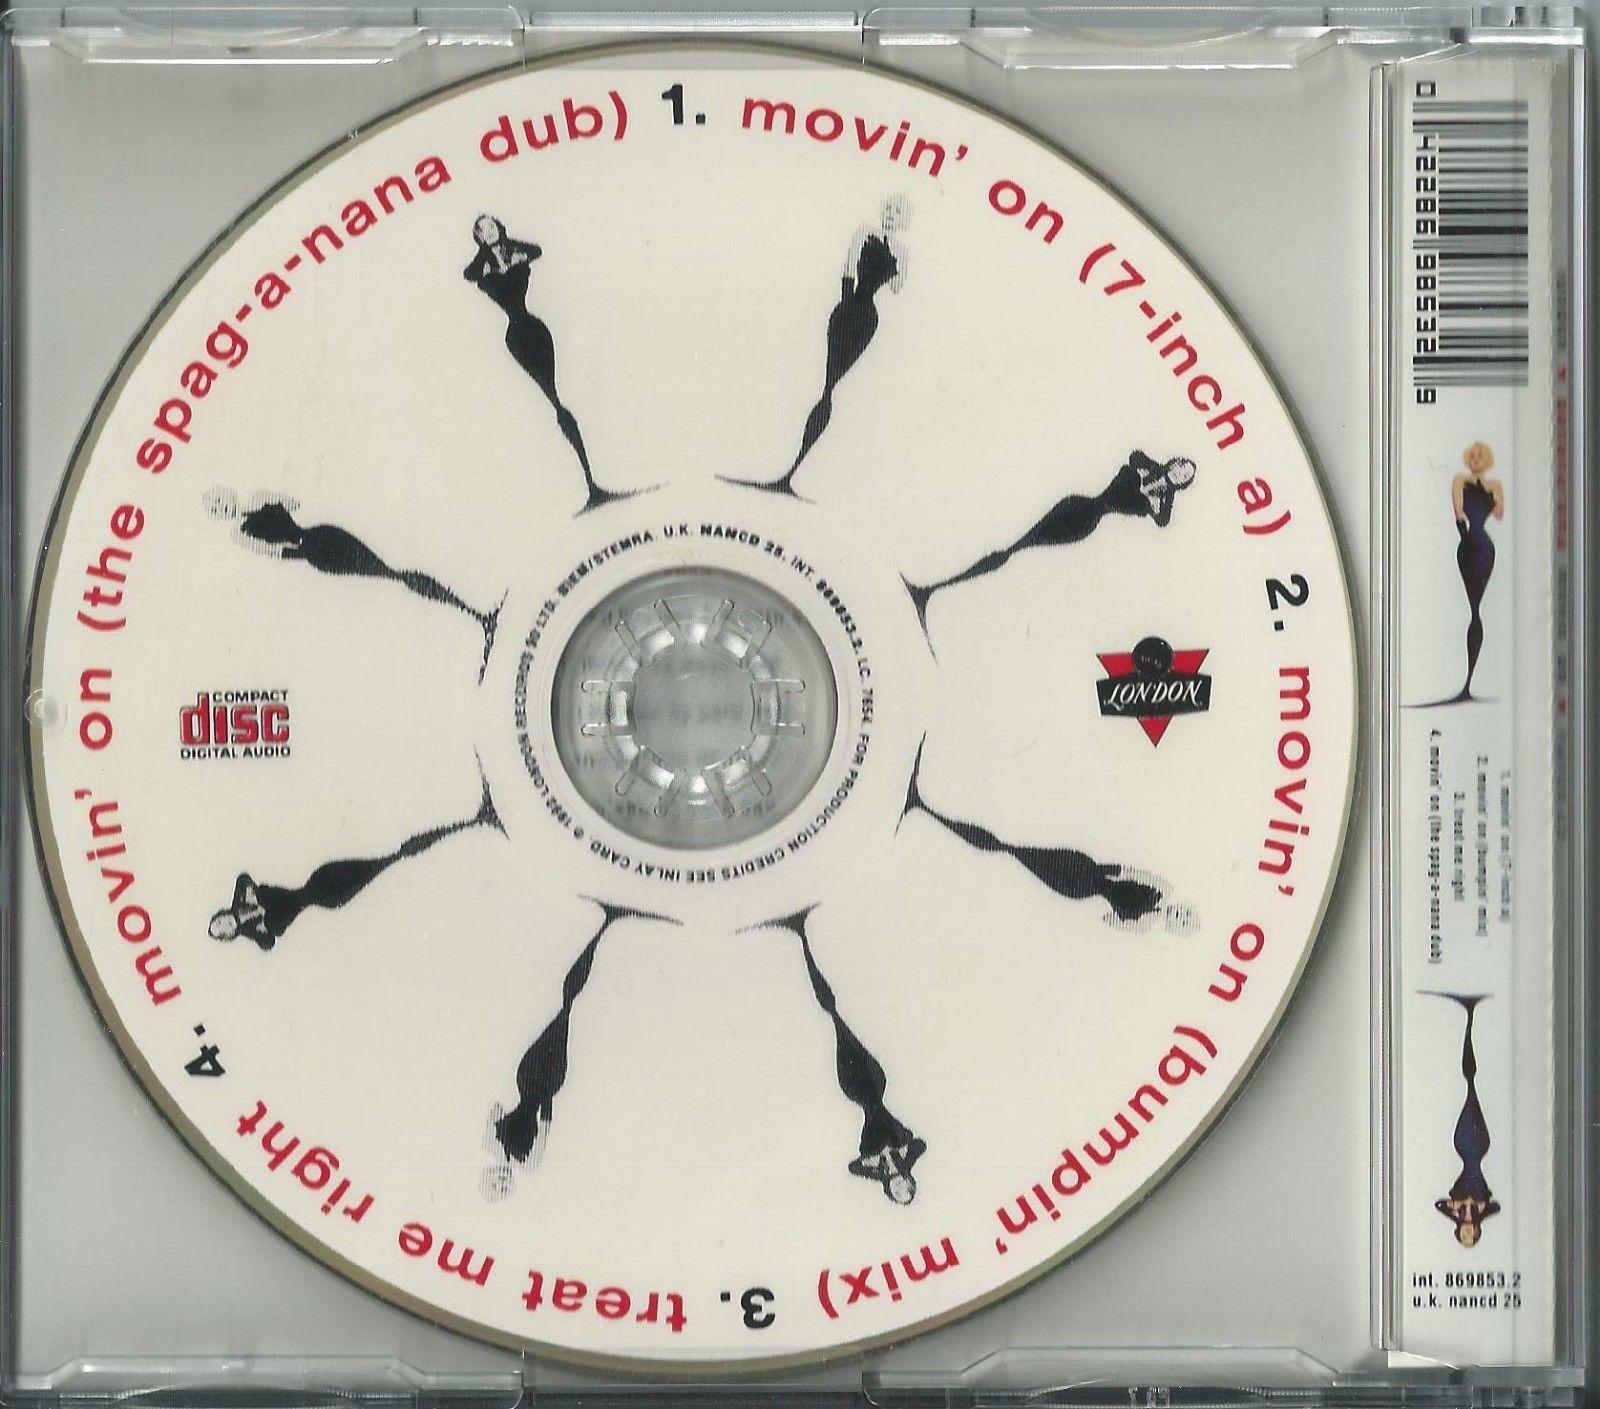 BANANARAMA - MOVIN' ON / TREAT ME RIGHT 1992 UK 4 TRACK CD SINGLE NANCD25